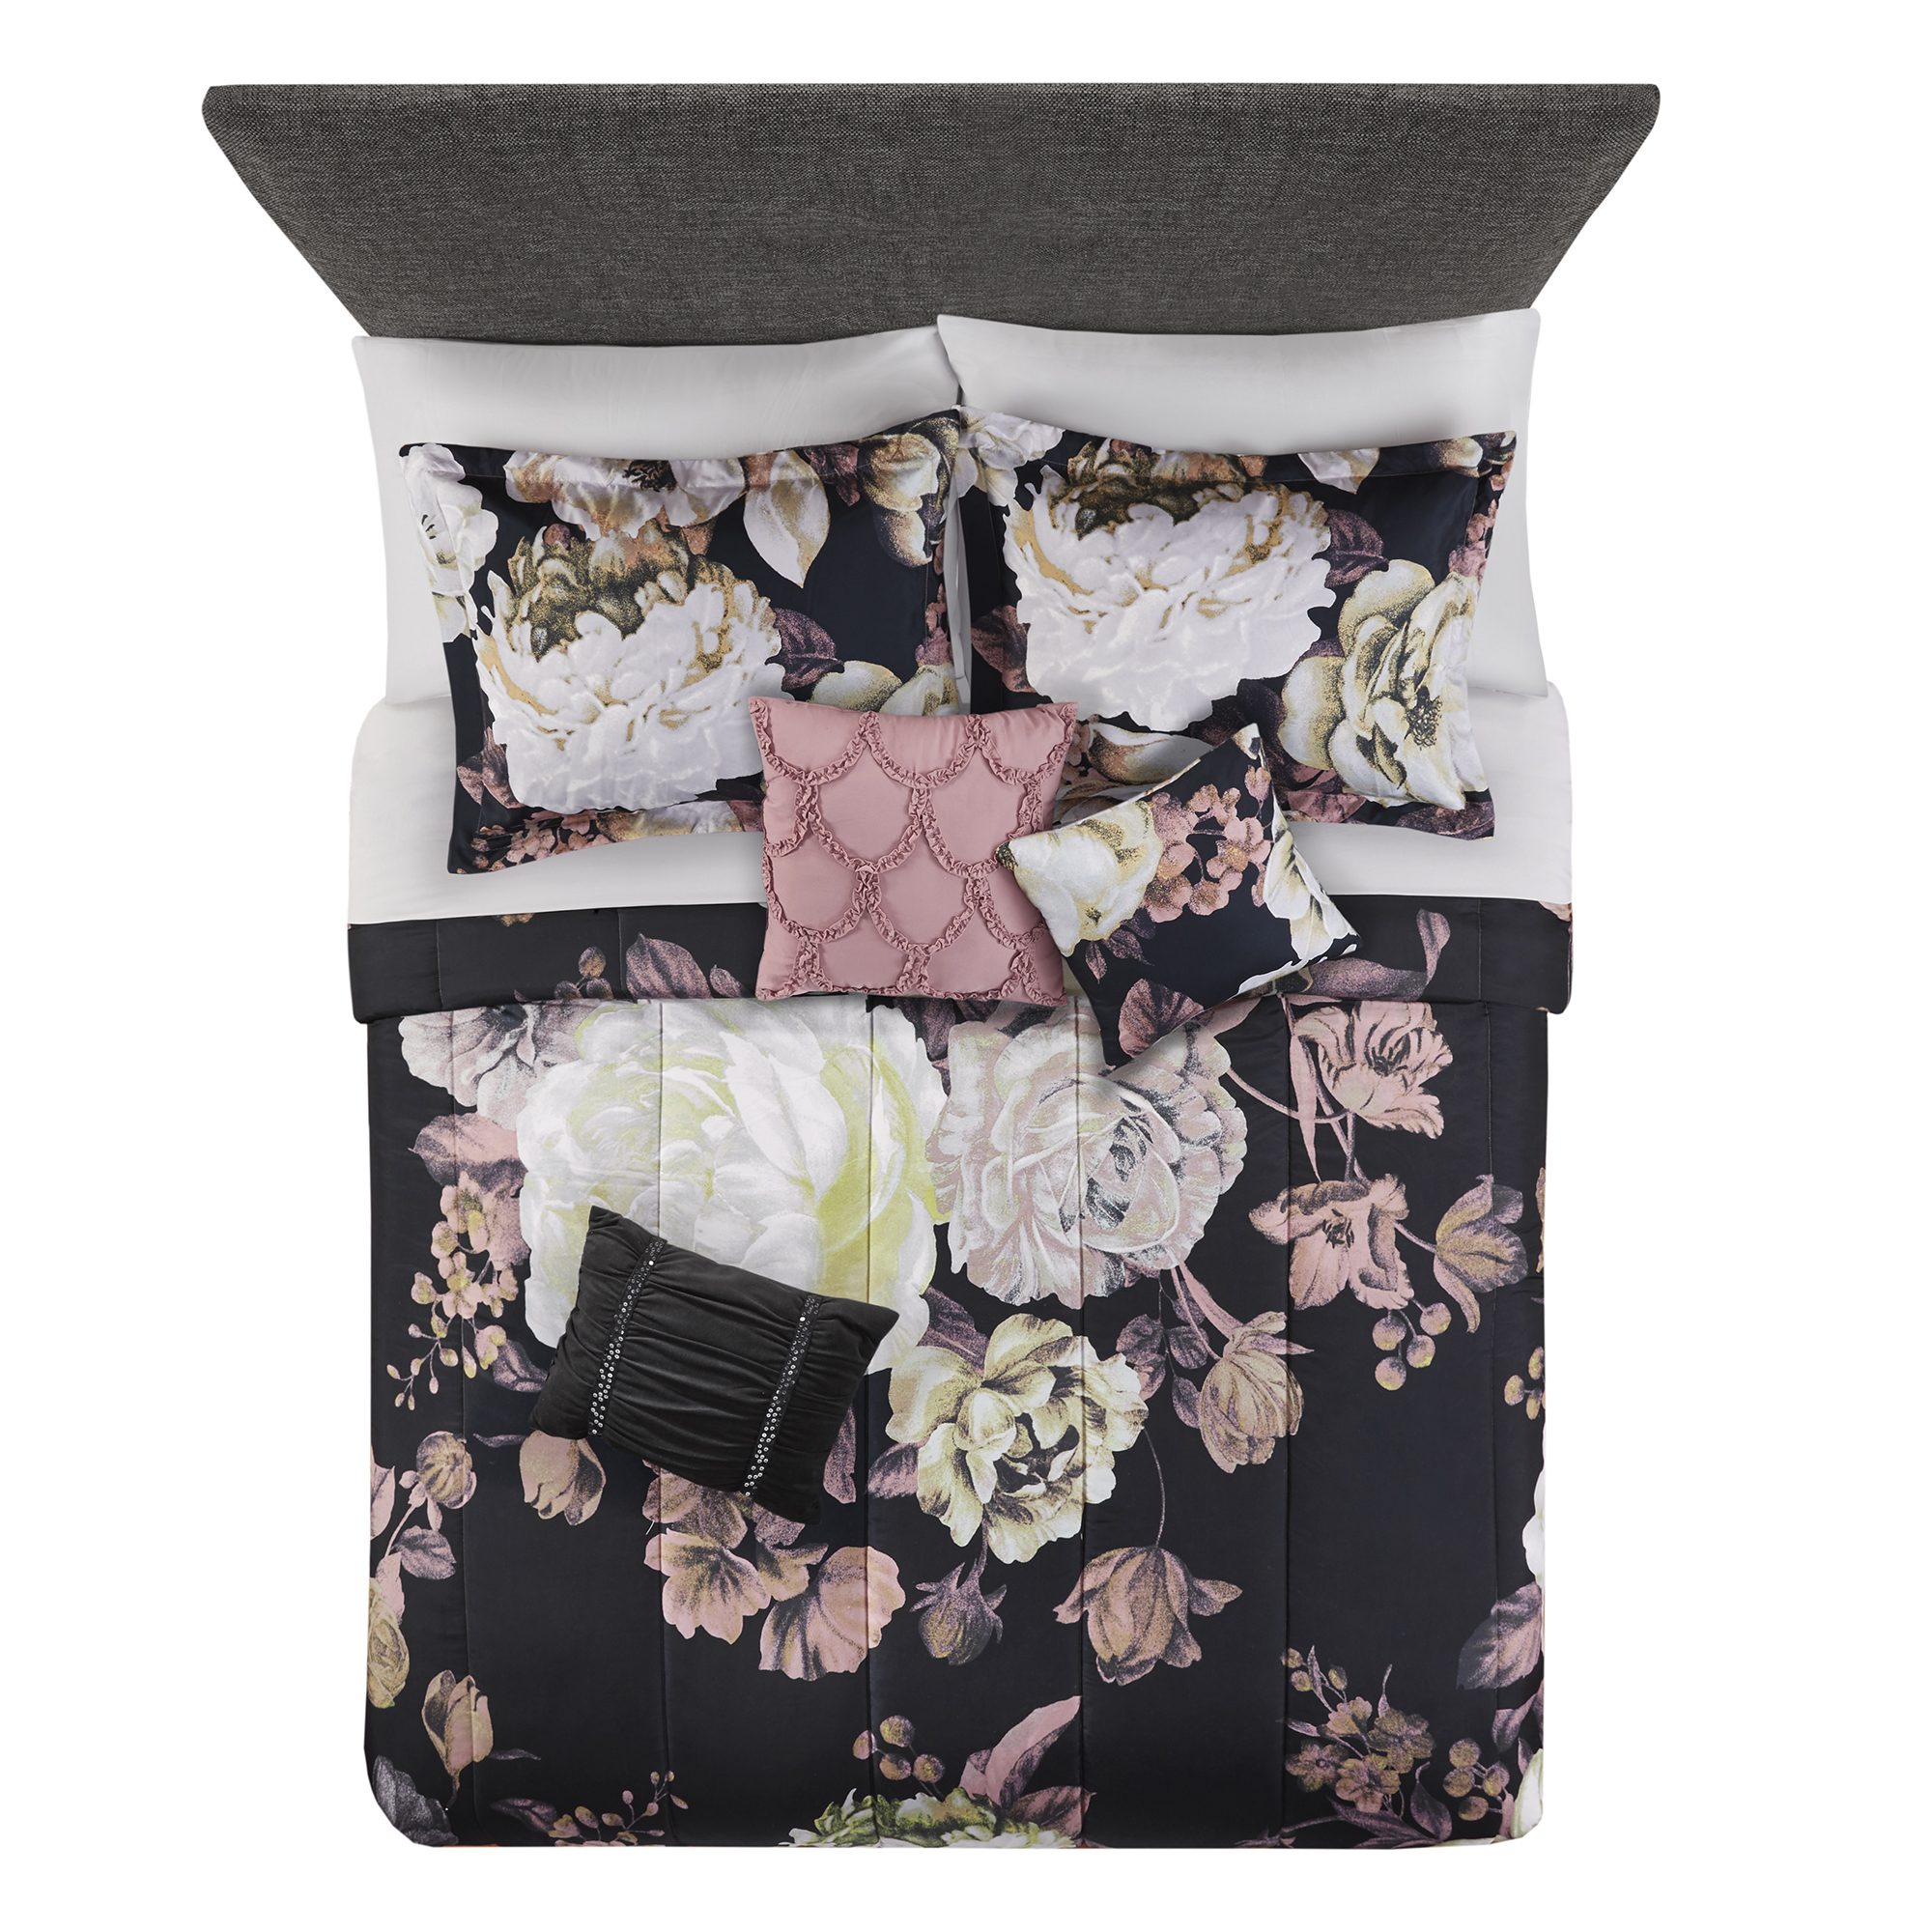 Mainstays Black Floral 10 Piece Bed In A Bag Bedding Set W